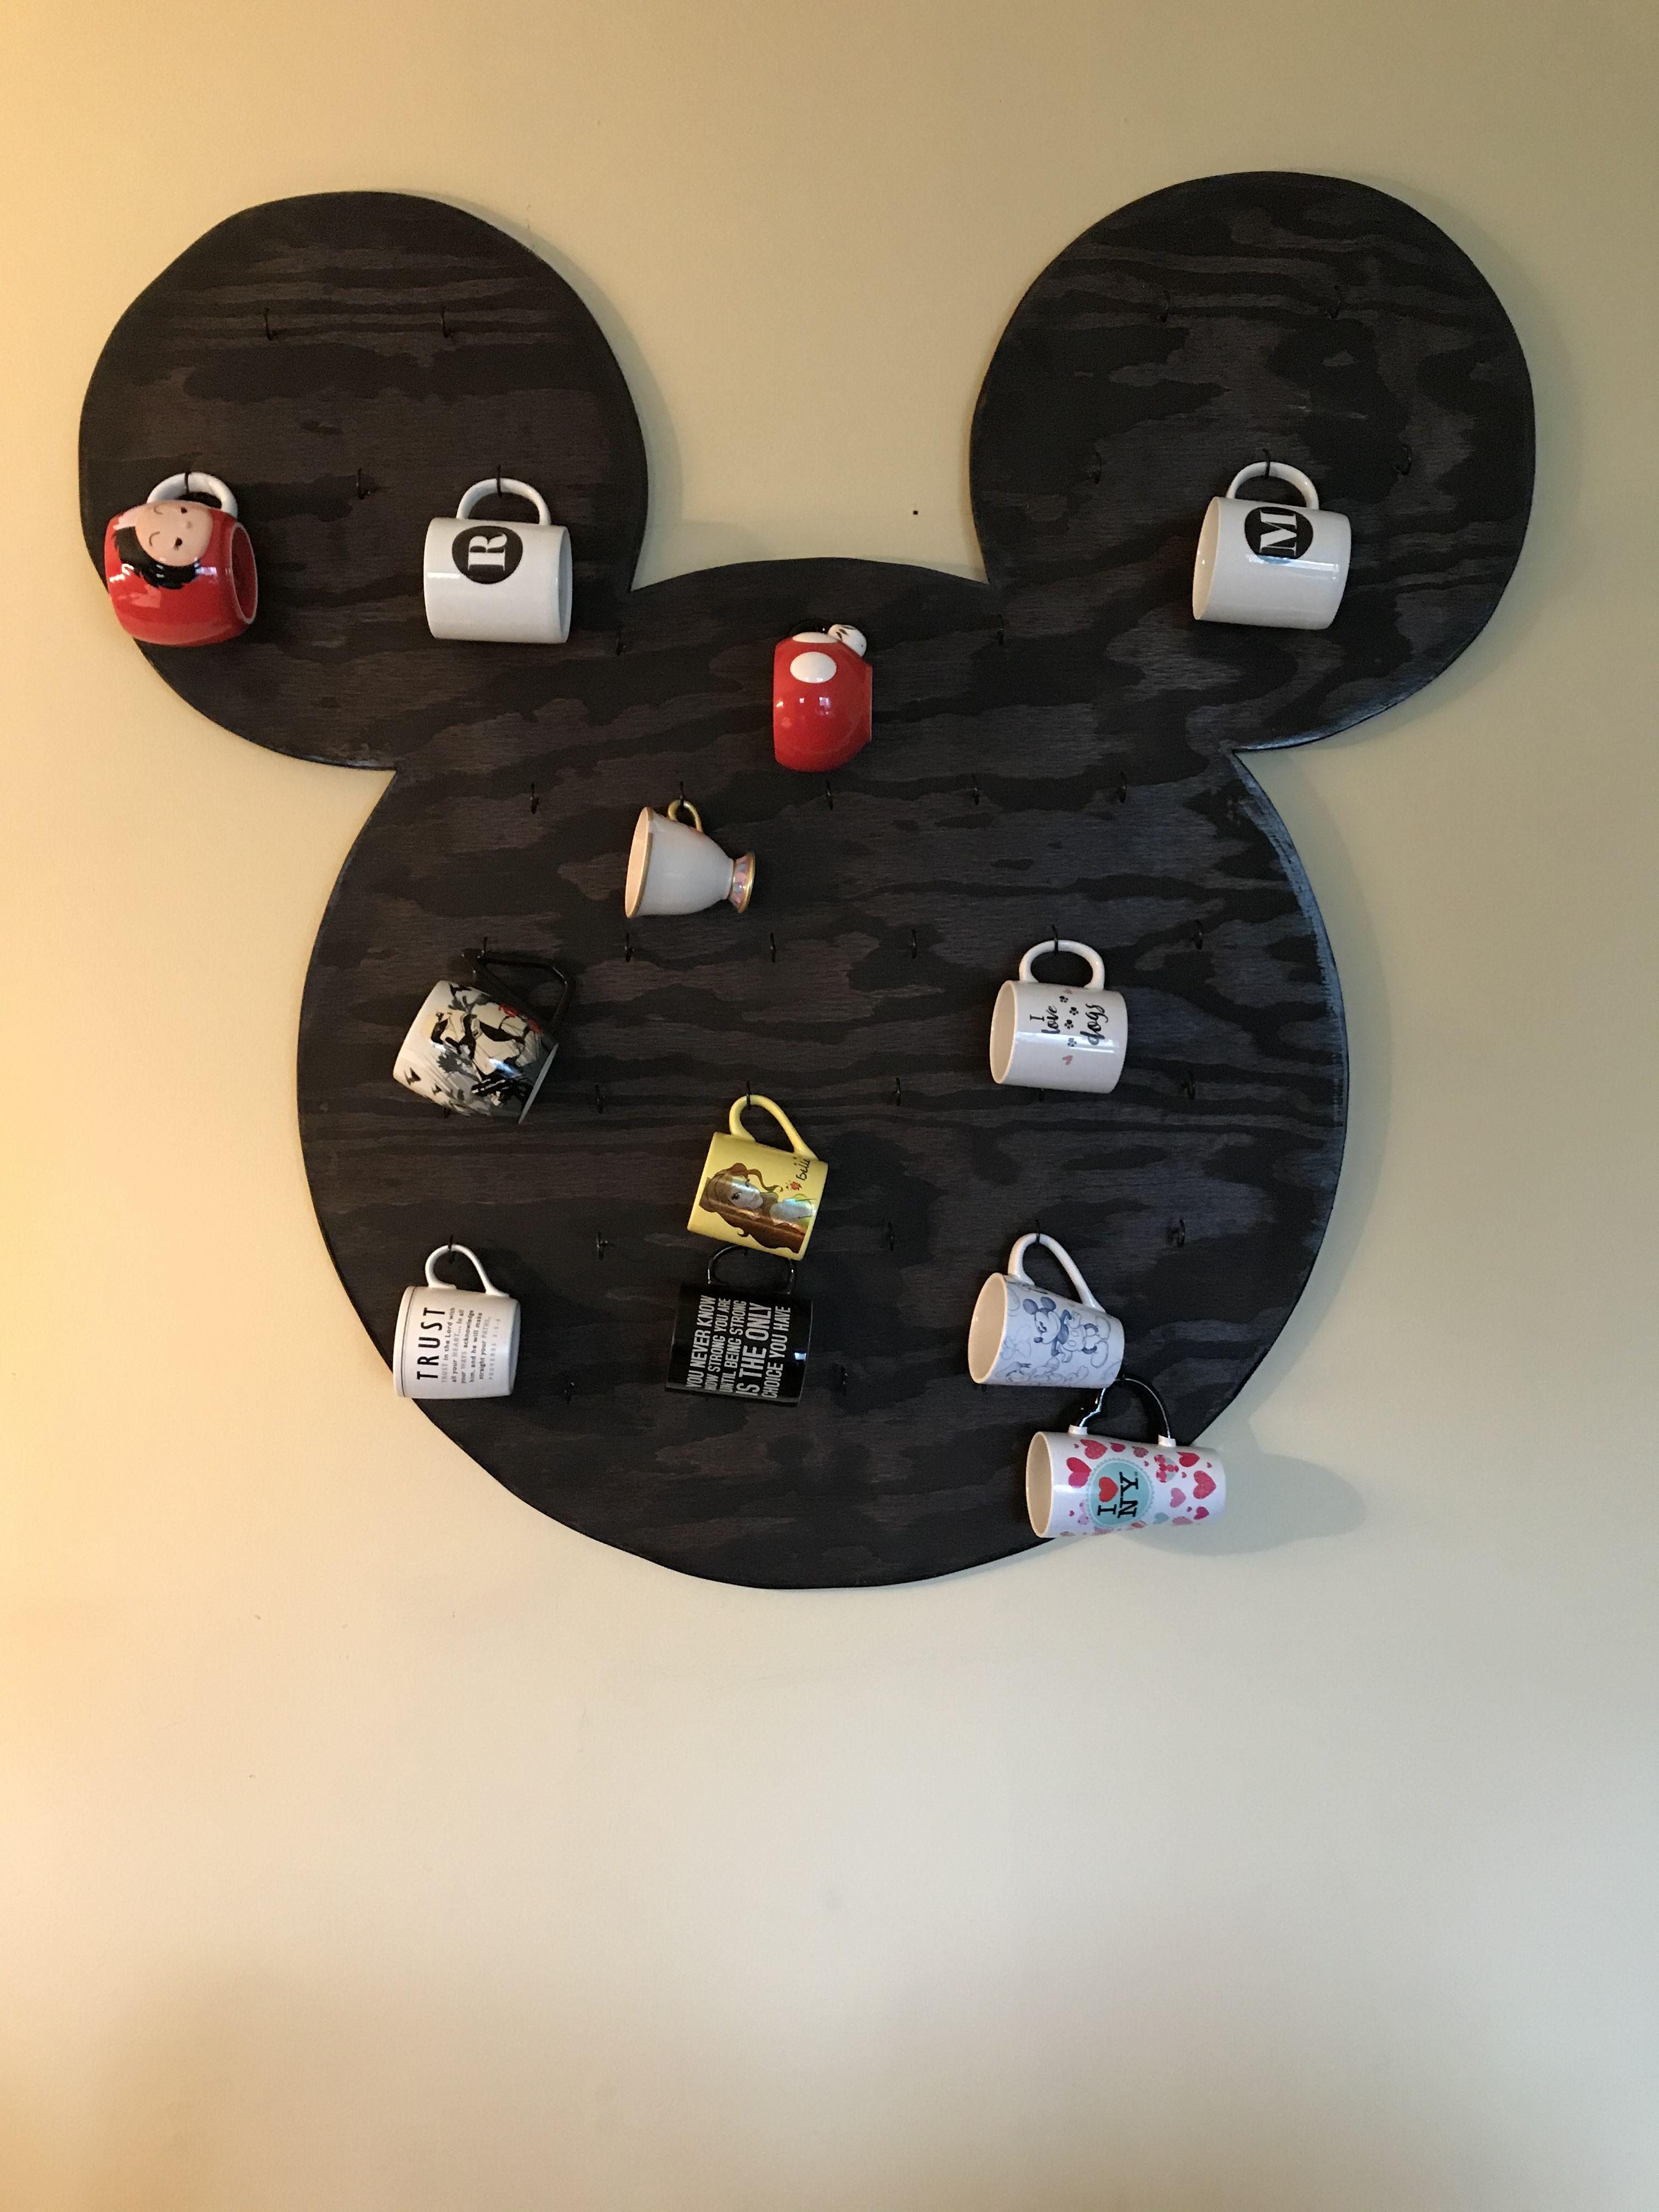 Coffee Mug Holder Disney Mickey Mouse 634385983261 Ebay Coffee Mug Holder Mug Holder Mickey Mouse Mug